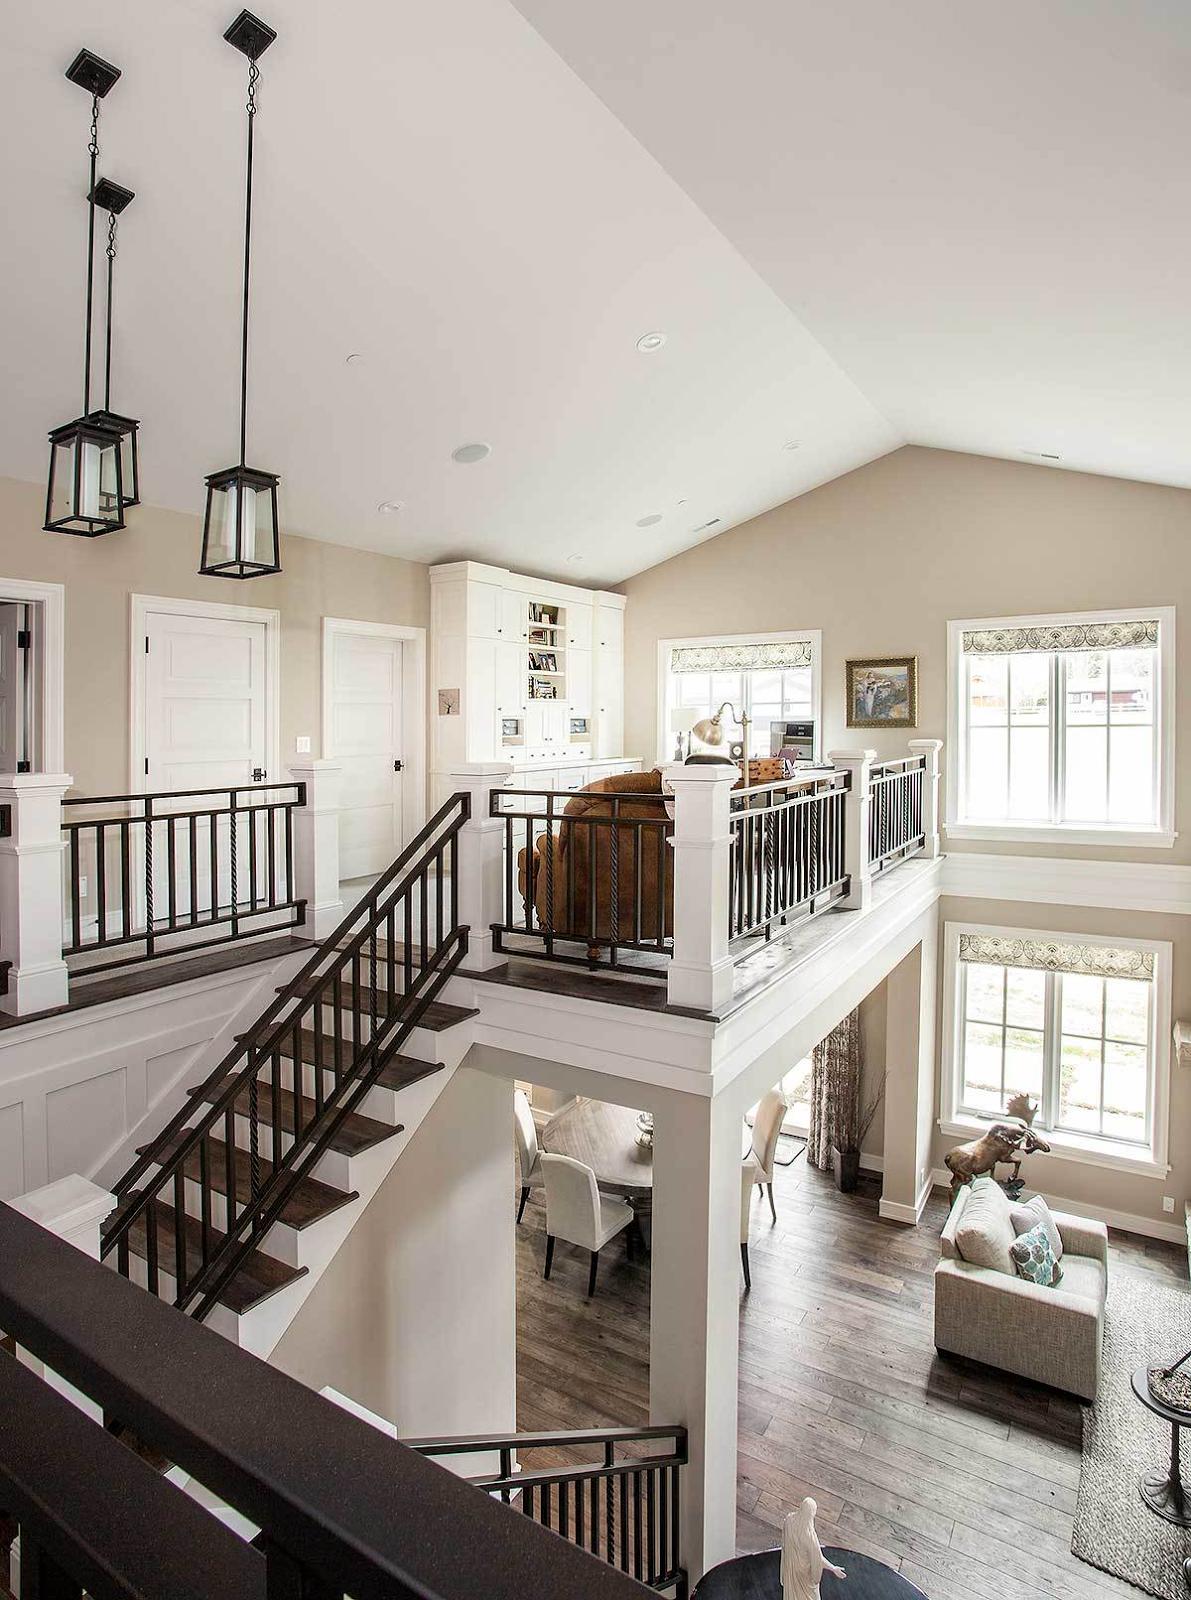 Best 25 Open Staircase Ideas On Pinterest: 35+ Upper Floor & Staircase Landing Design Ideas (Photos